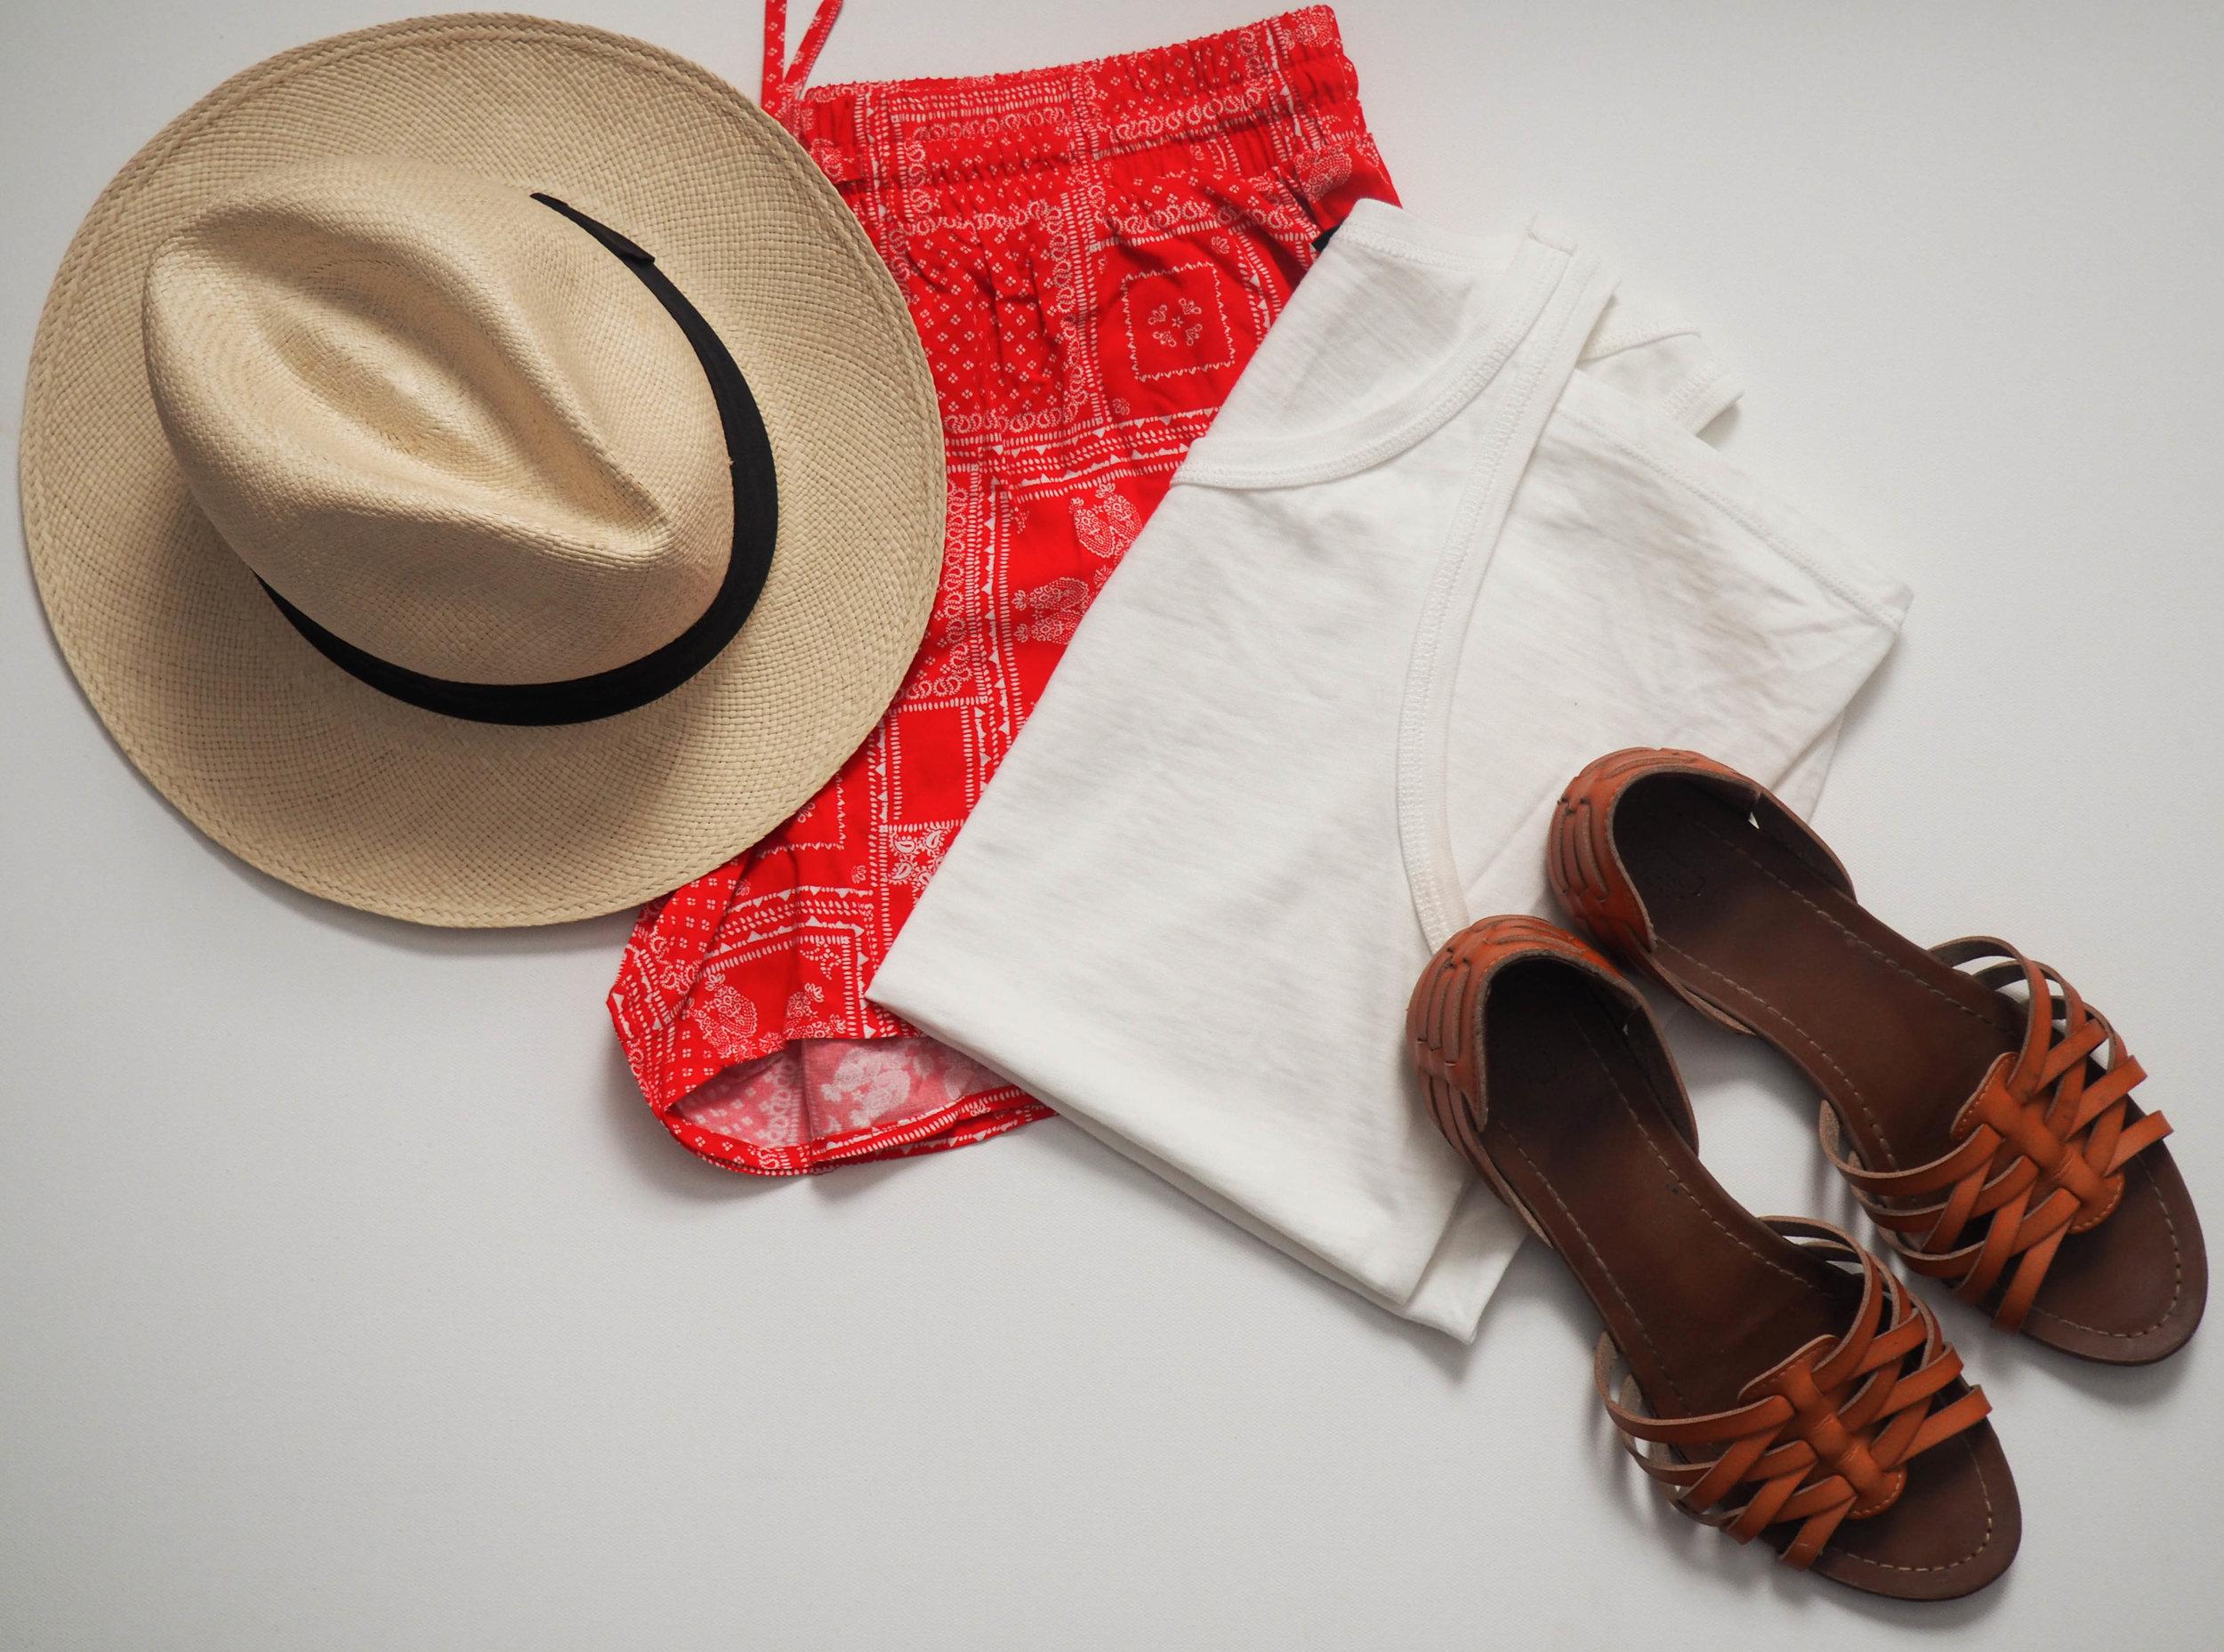 J. Crew Panama Hat  |  Target Soft Shorts  |  Target Gena Flats